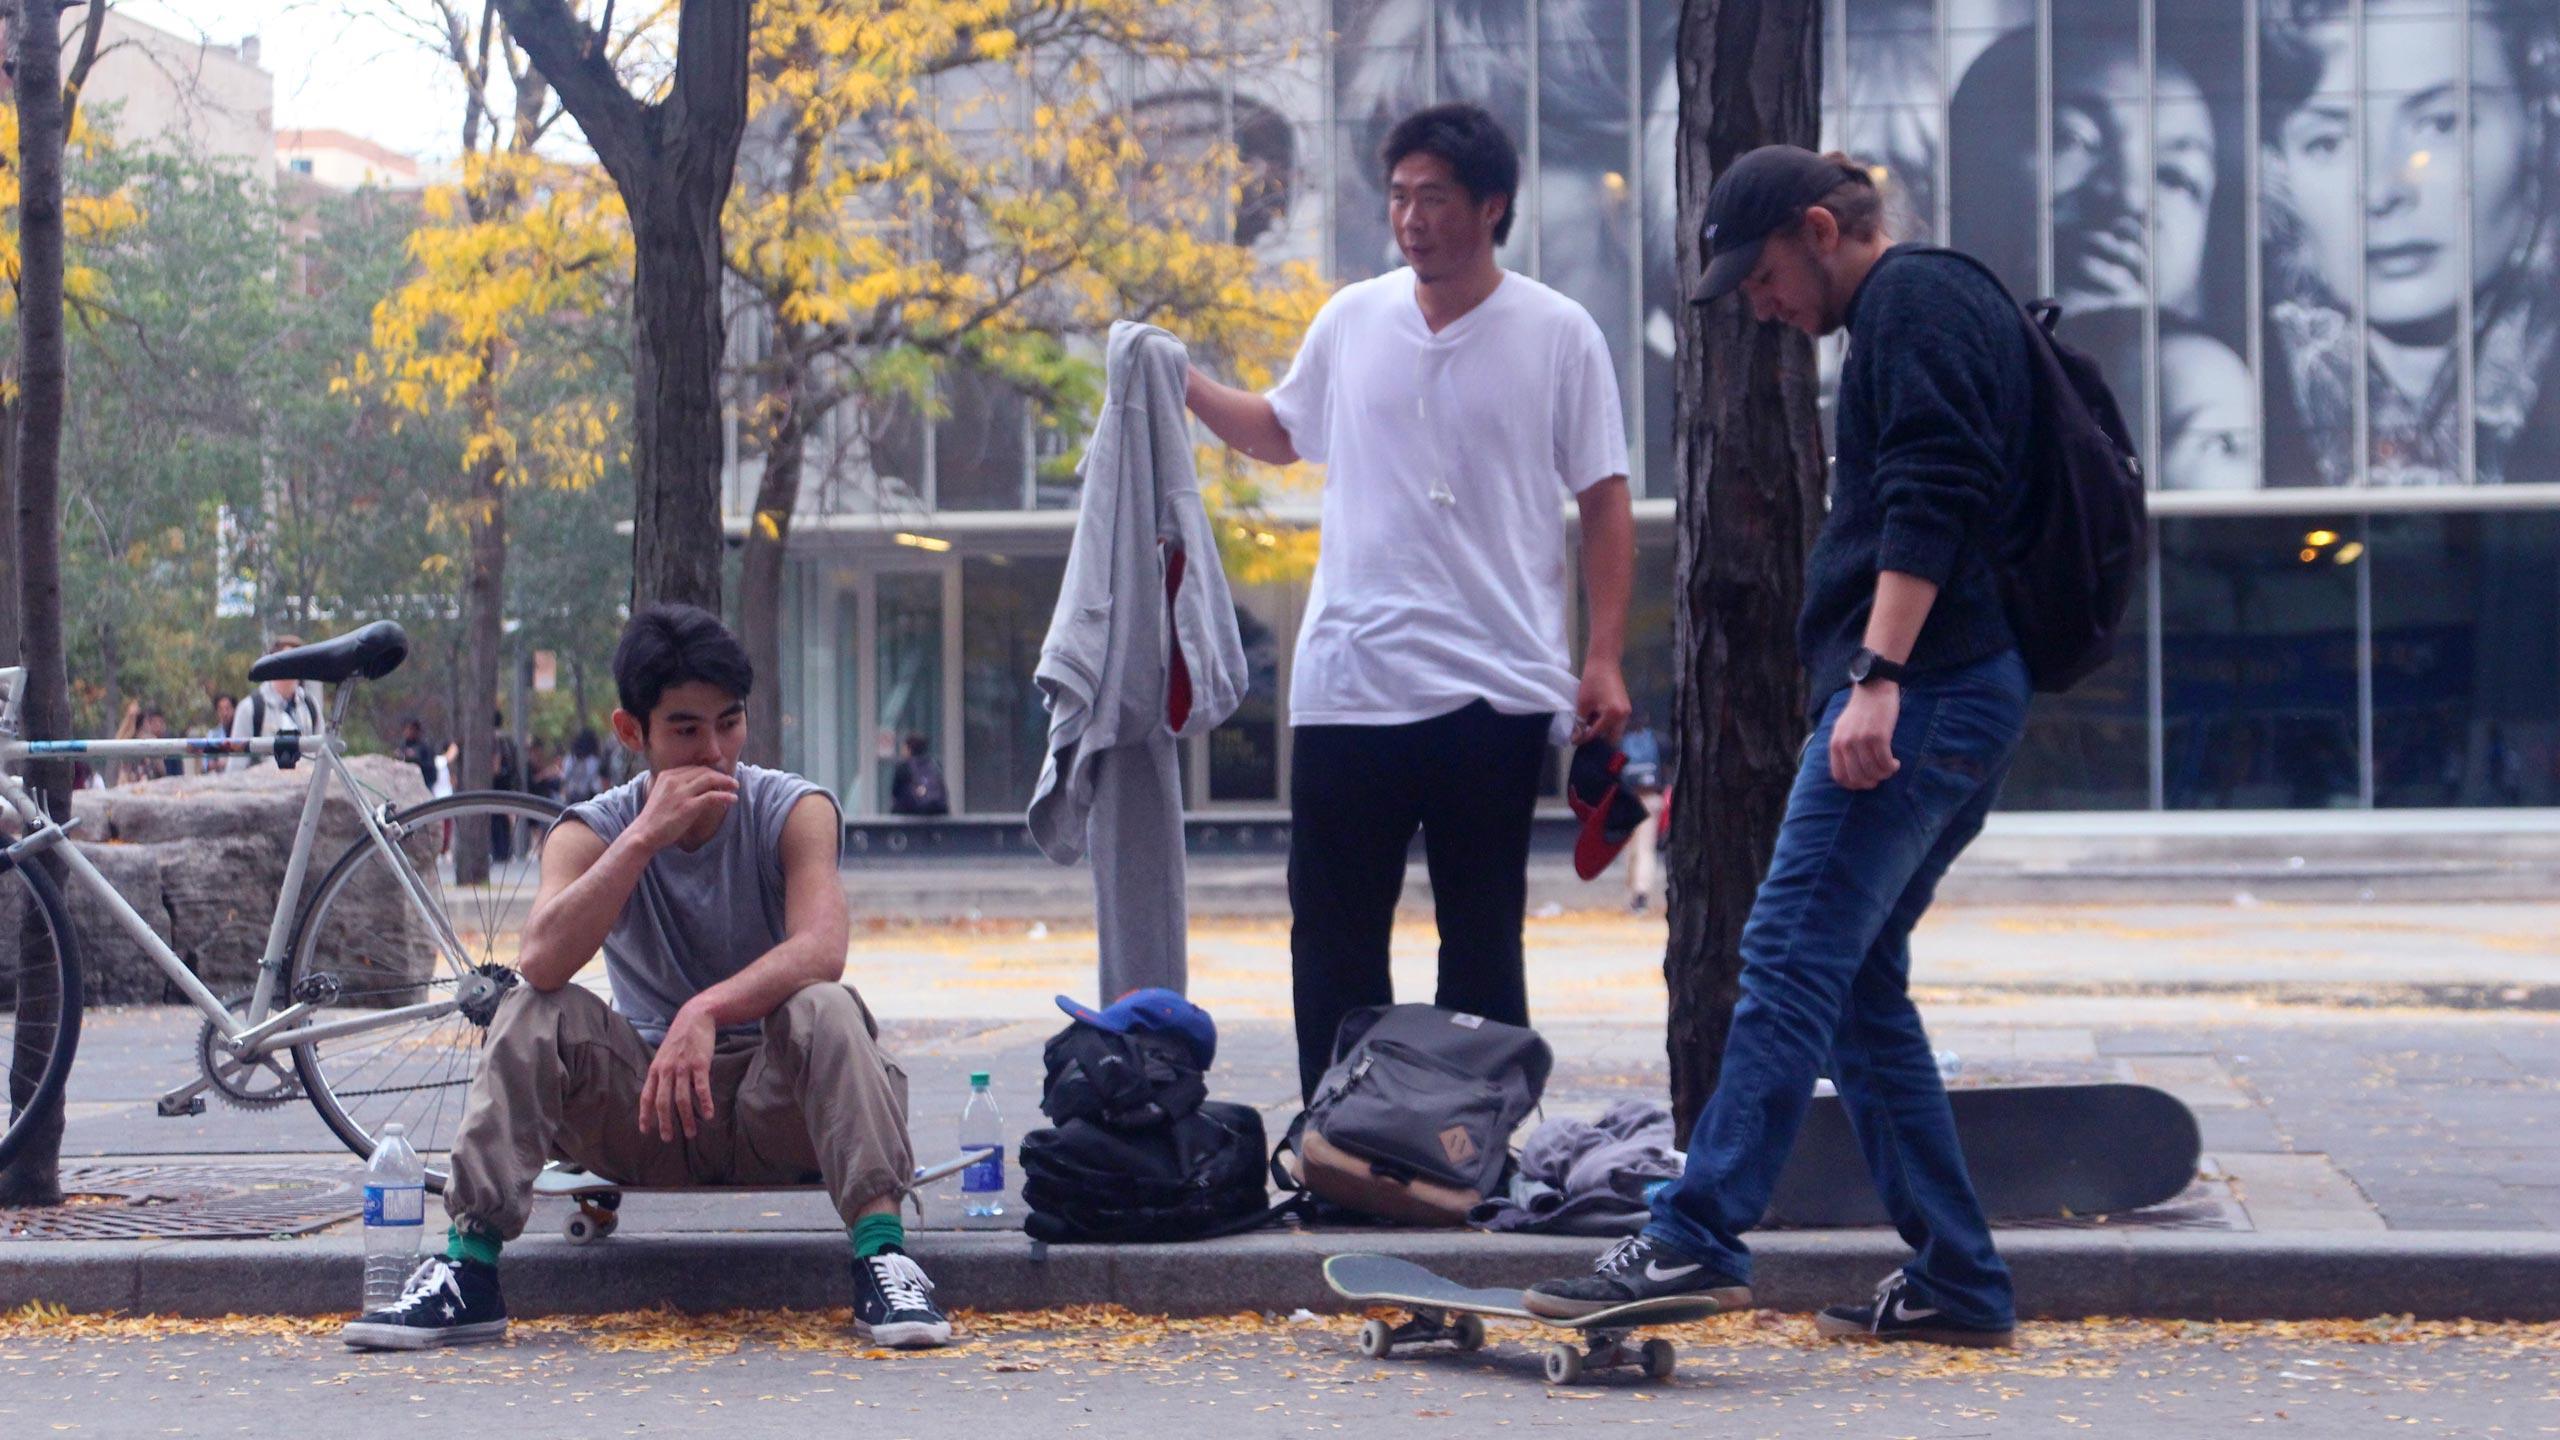 oct18_2016_skateboarding_features_chrisblanchette2